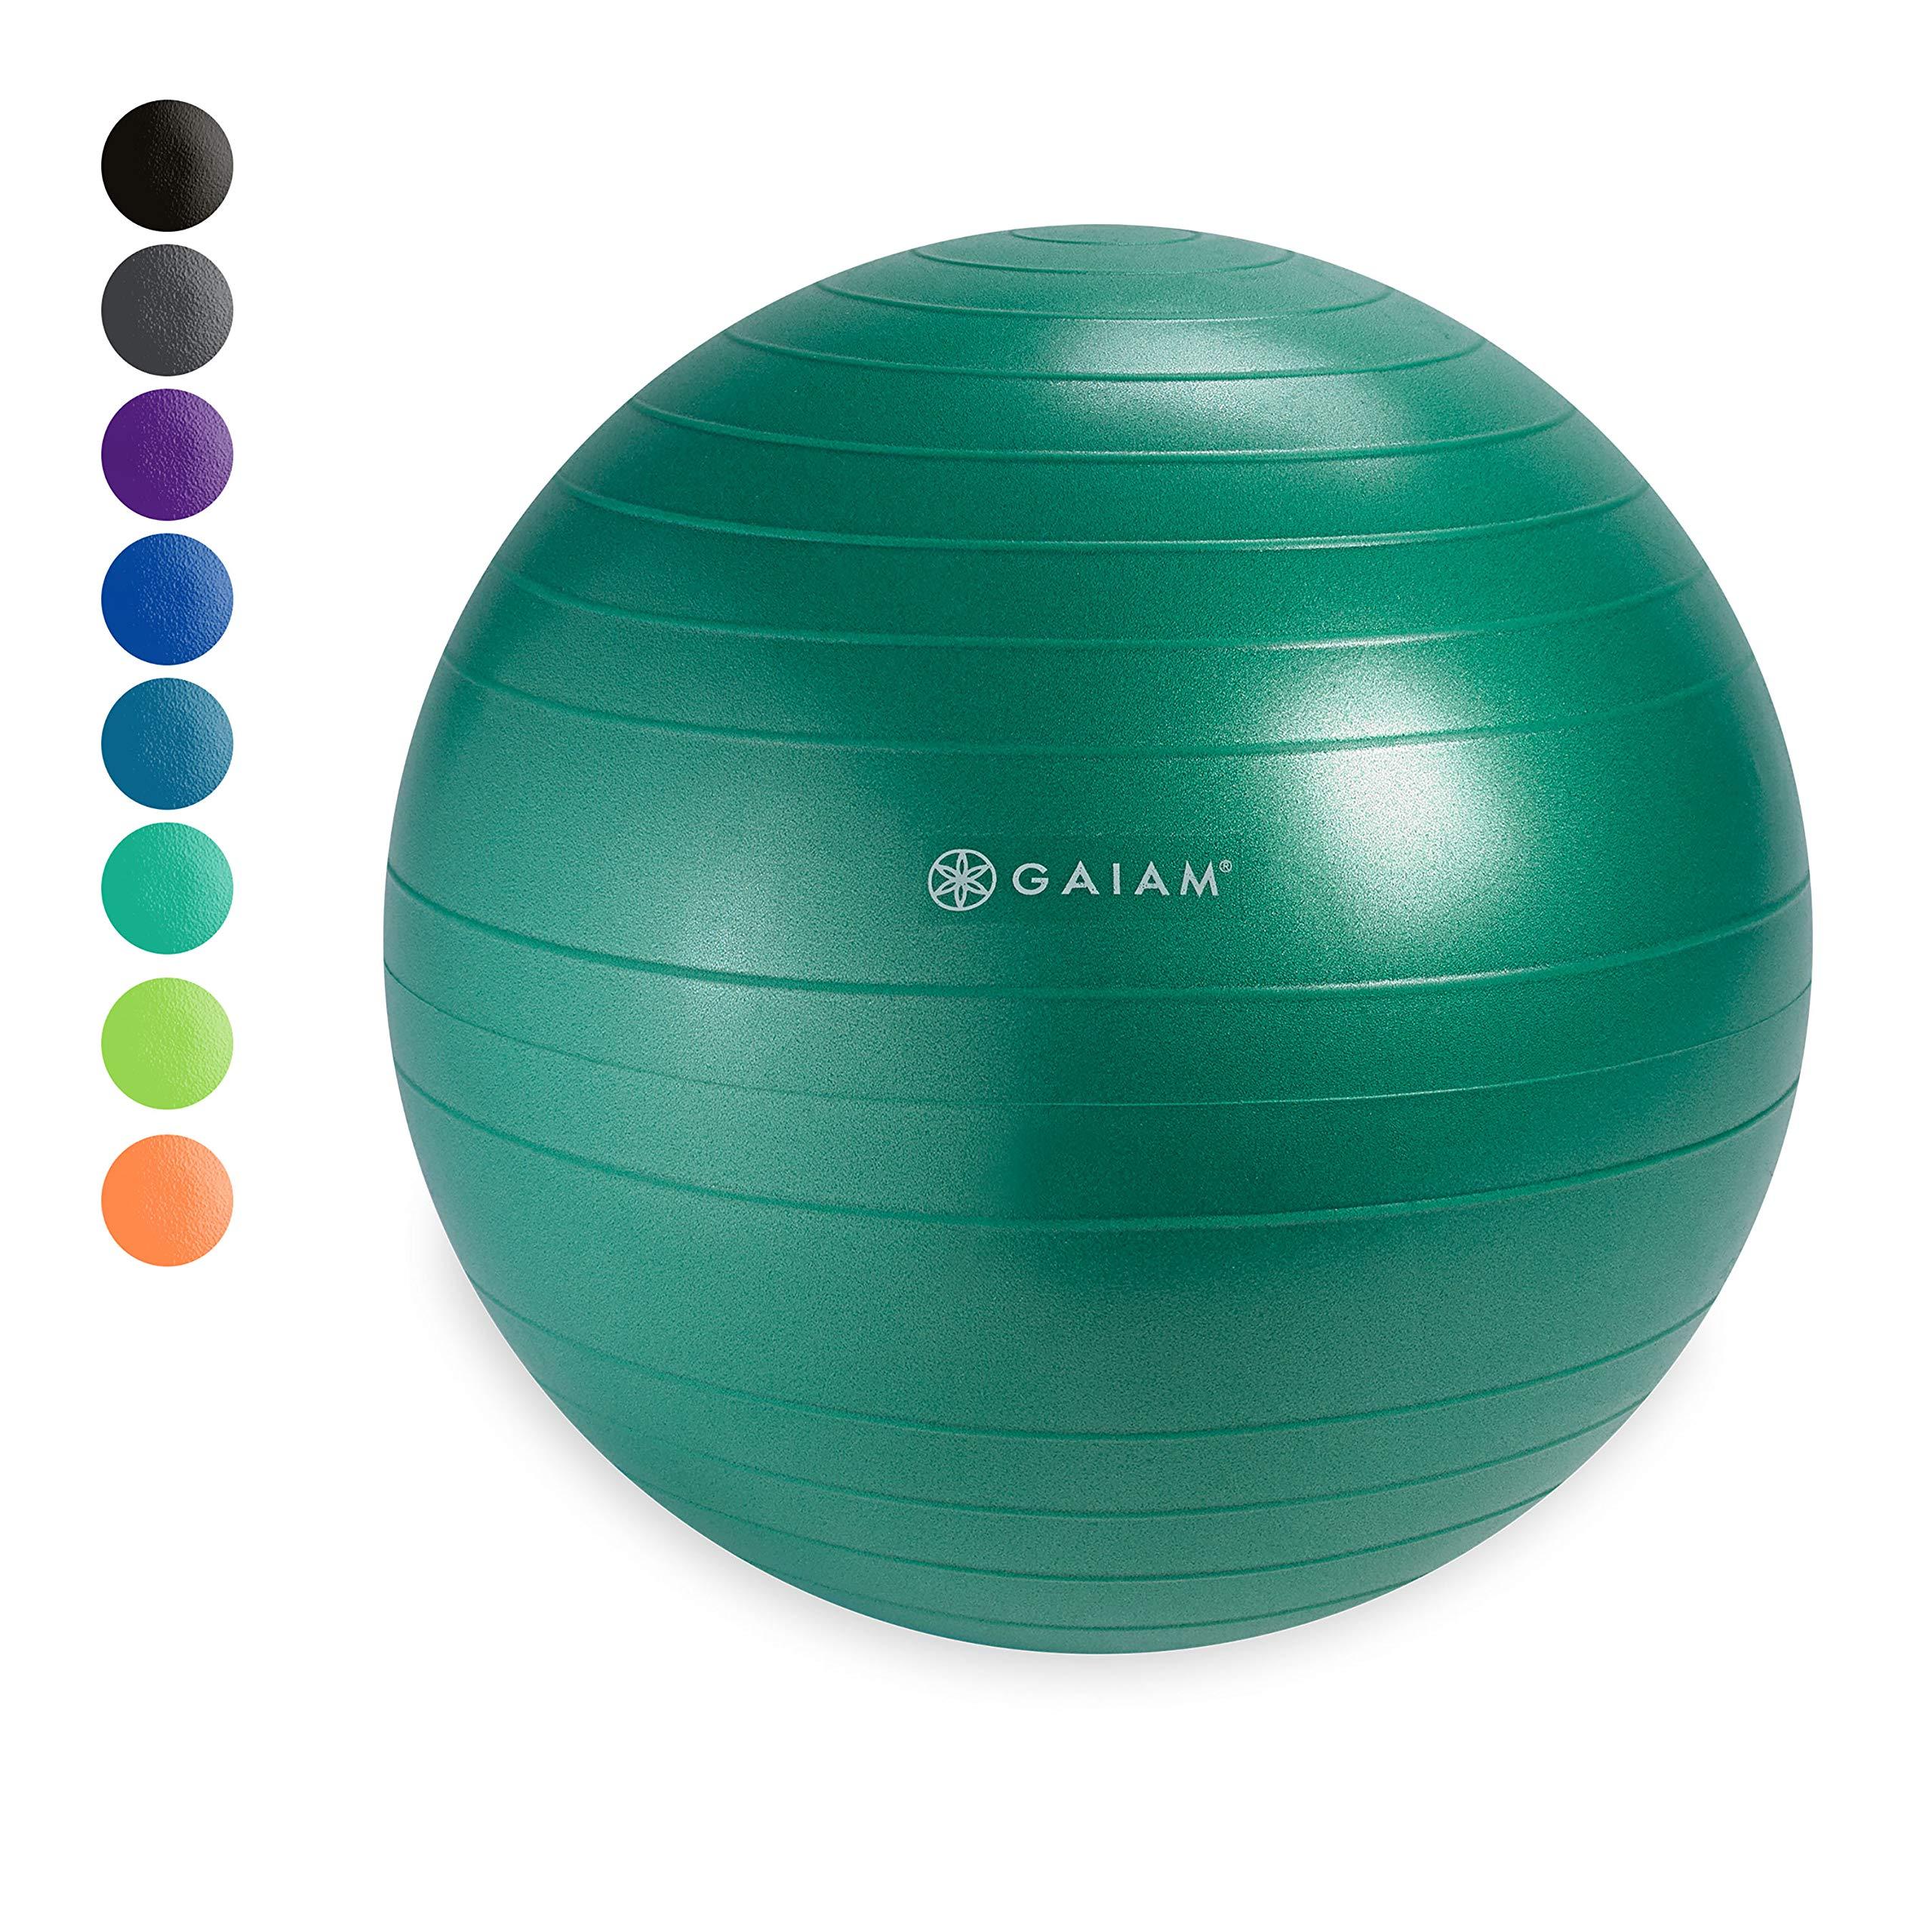 Gaiam Classic Balance Ball Chair Ball - Extra 52cm Balance Ball for Classic Balance Ball Chairs, Green